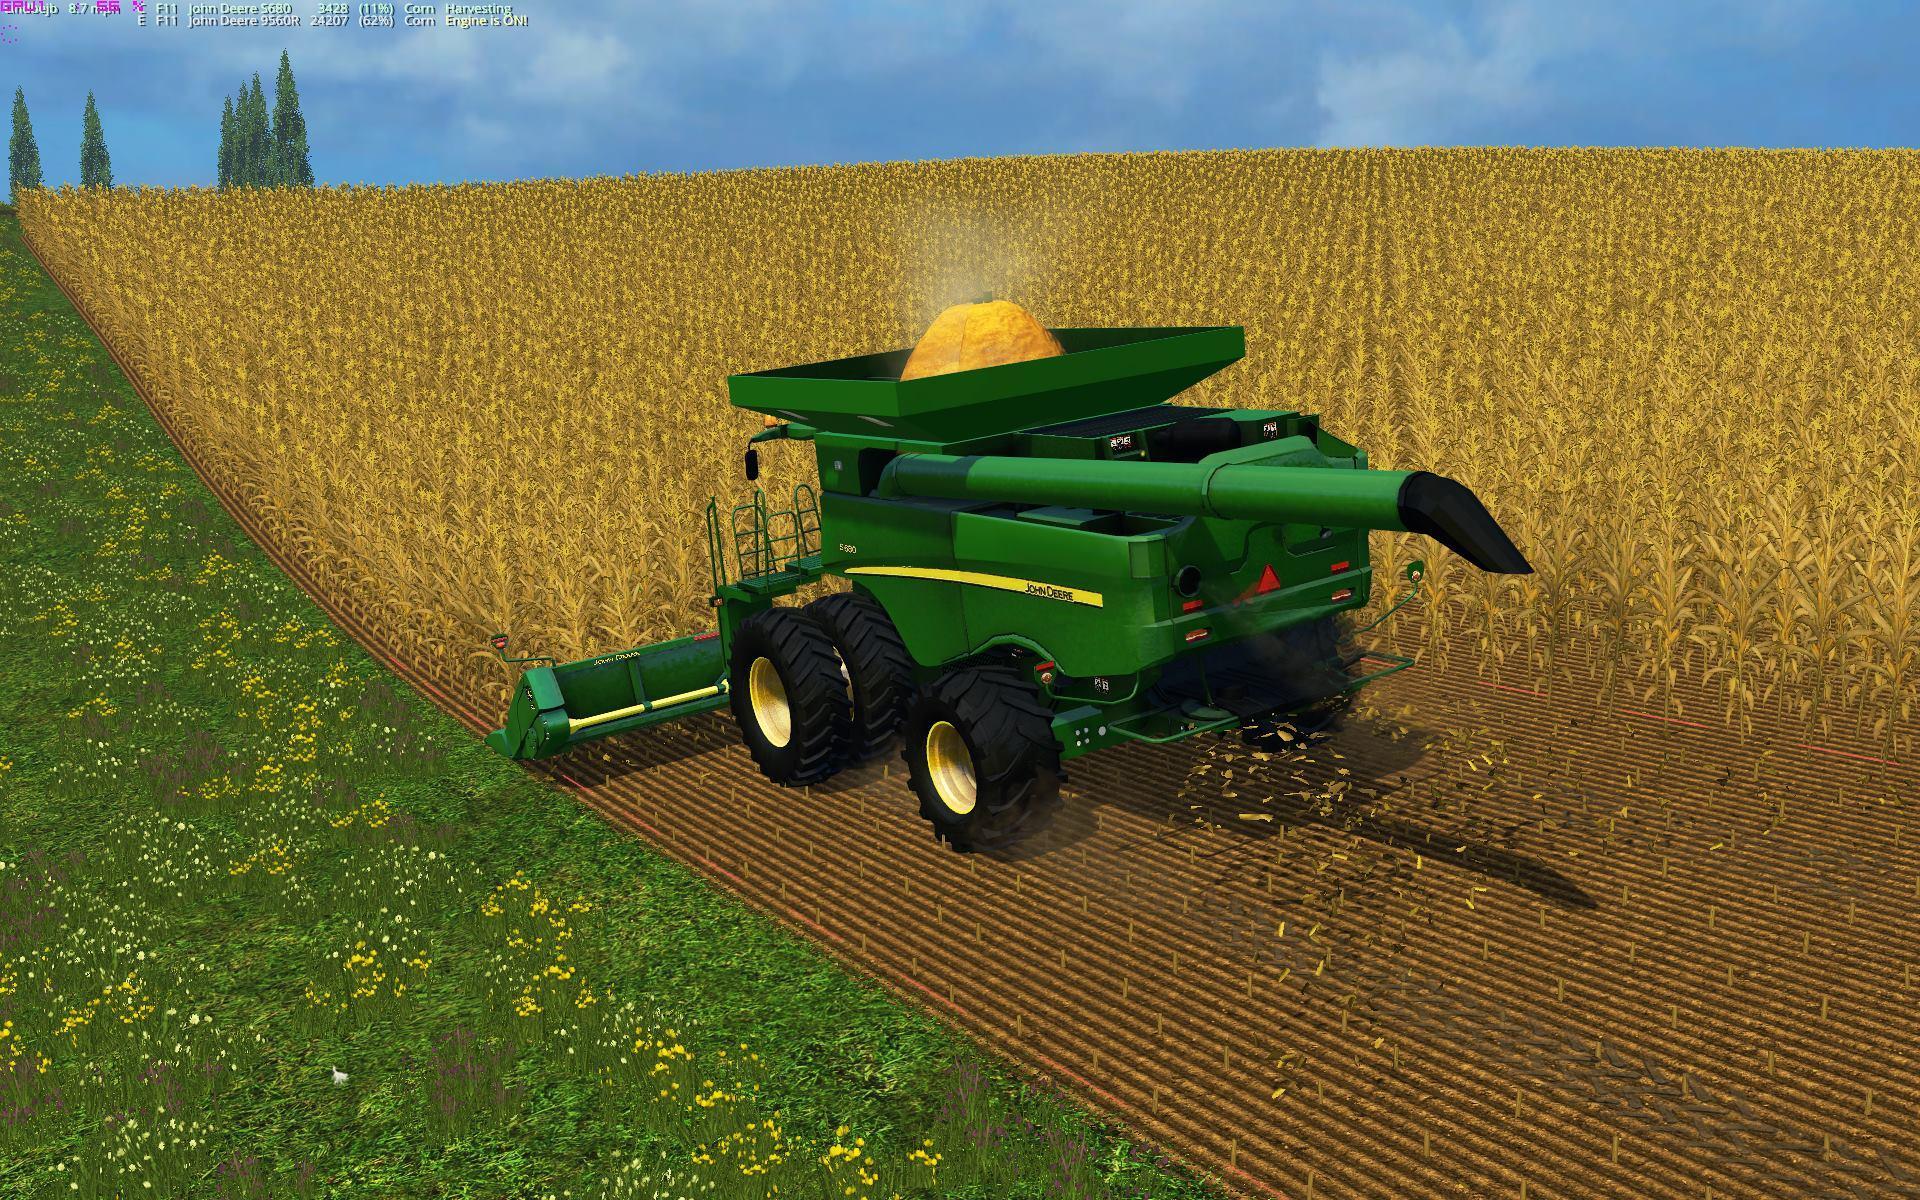 JOHN DEERE 690I Combine V1 - Farming simulator 2017 / 2015 ...